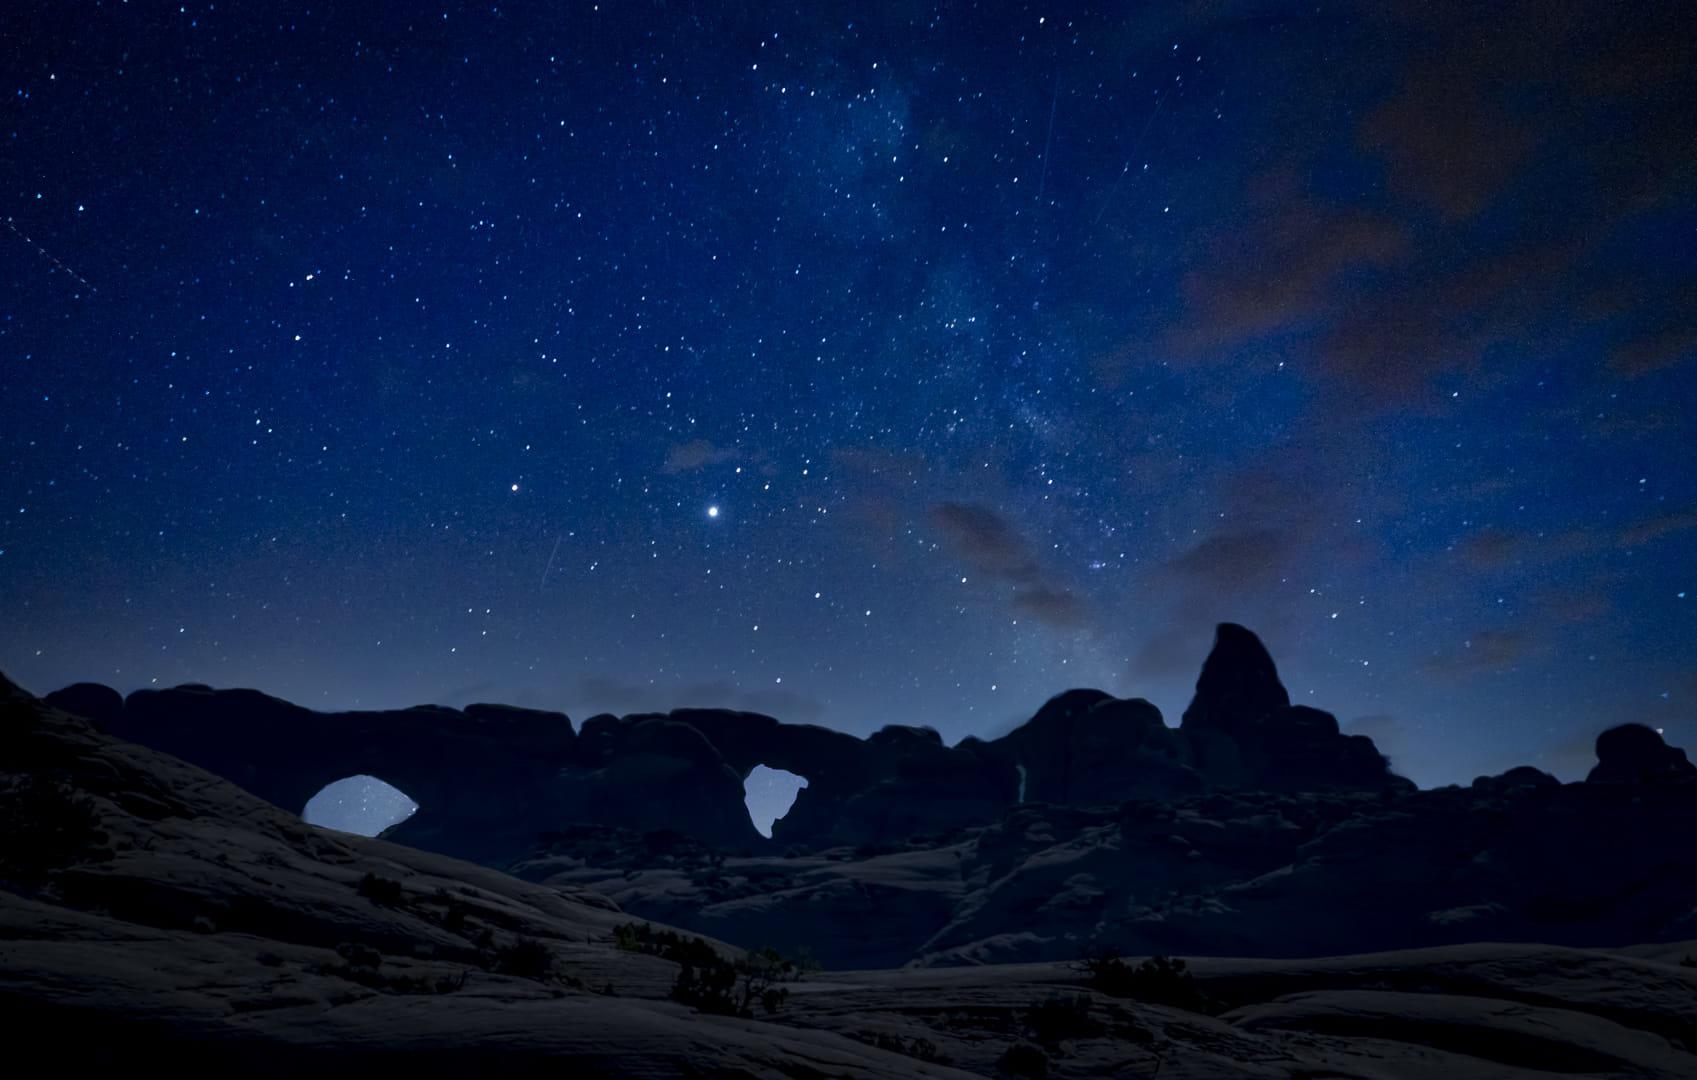 Milky way rising